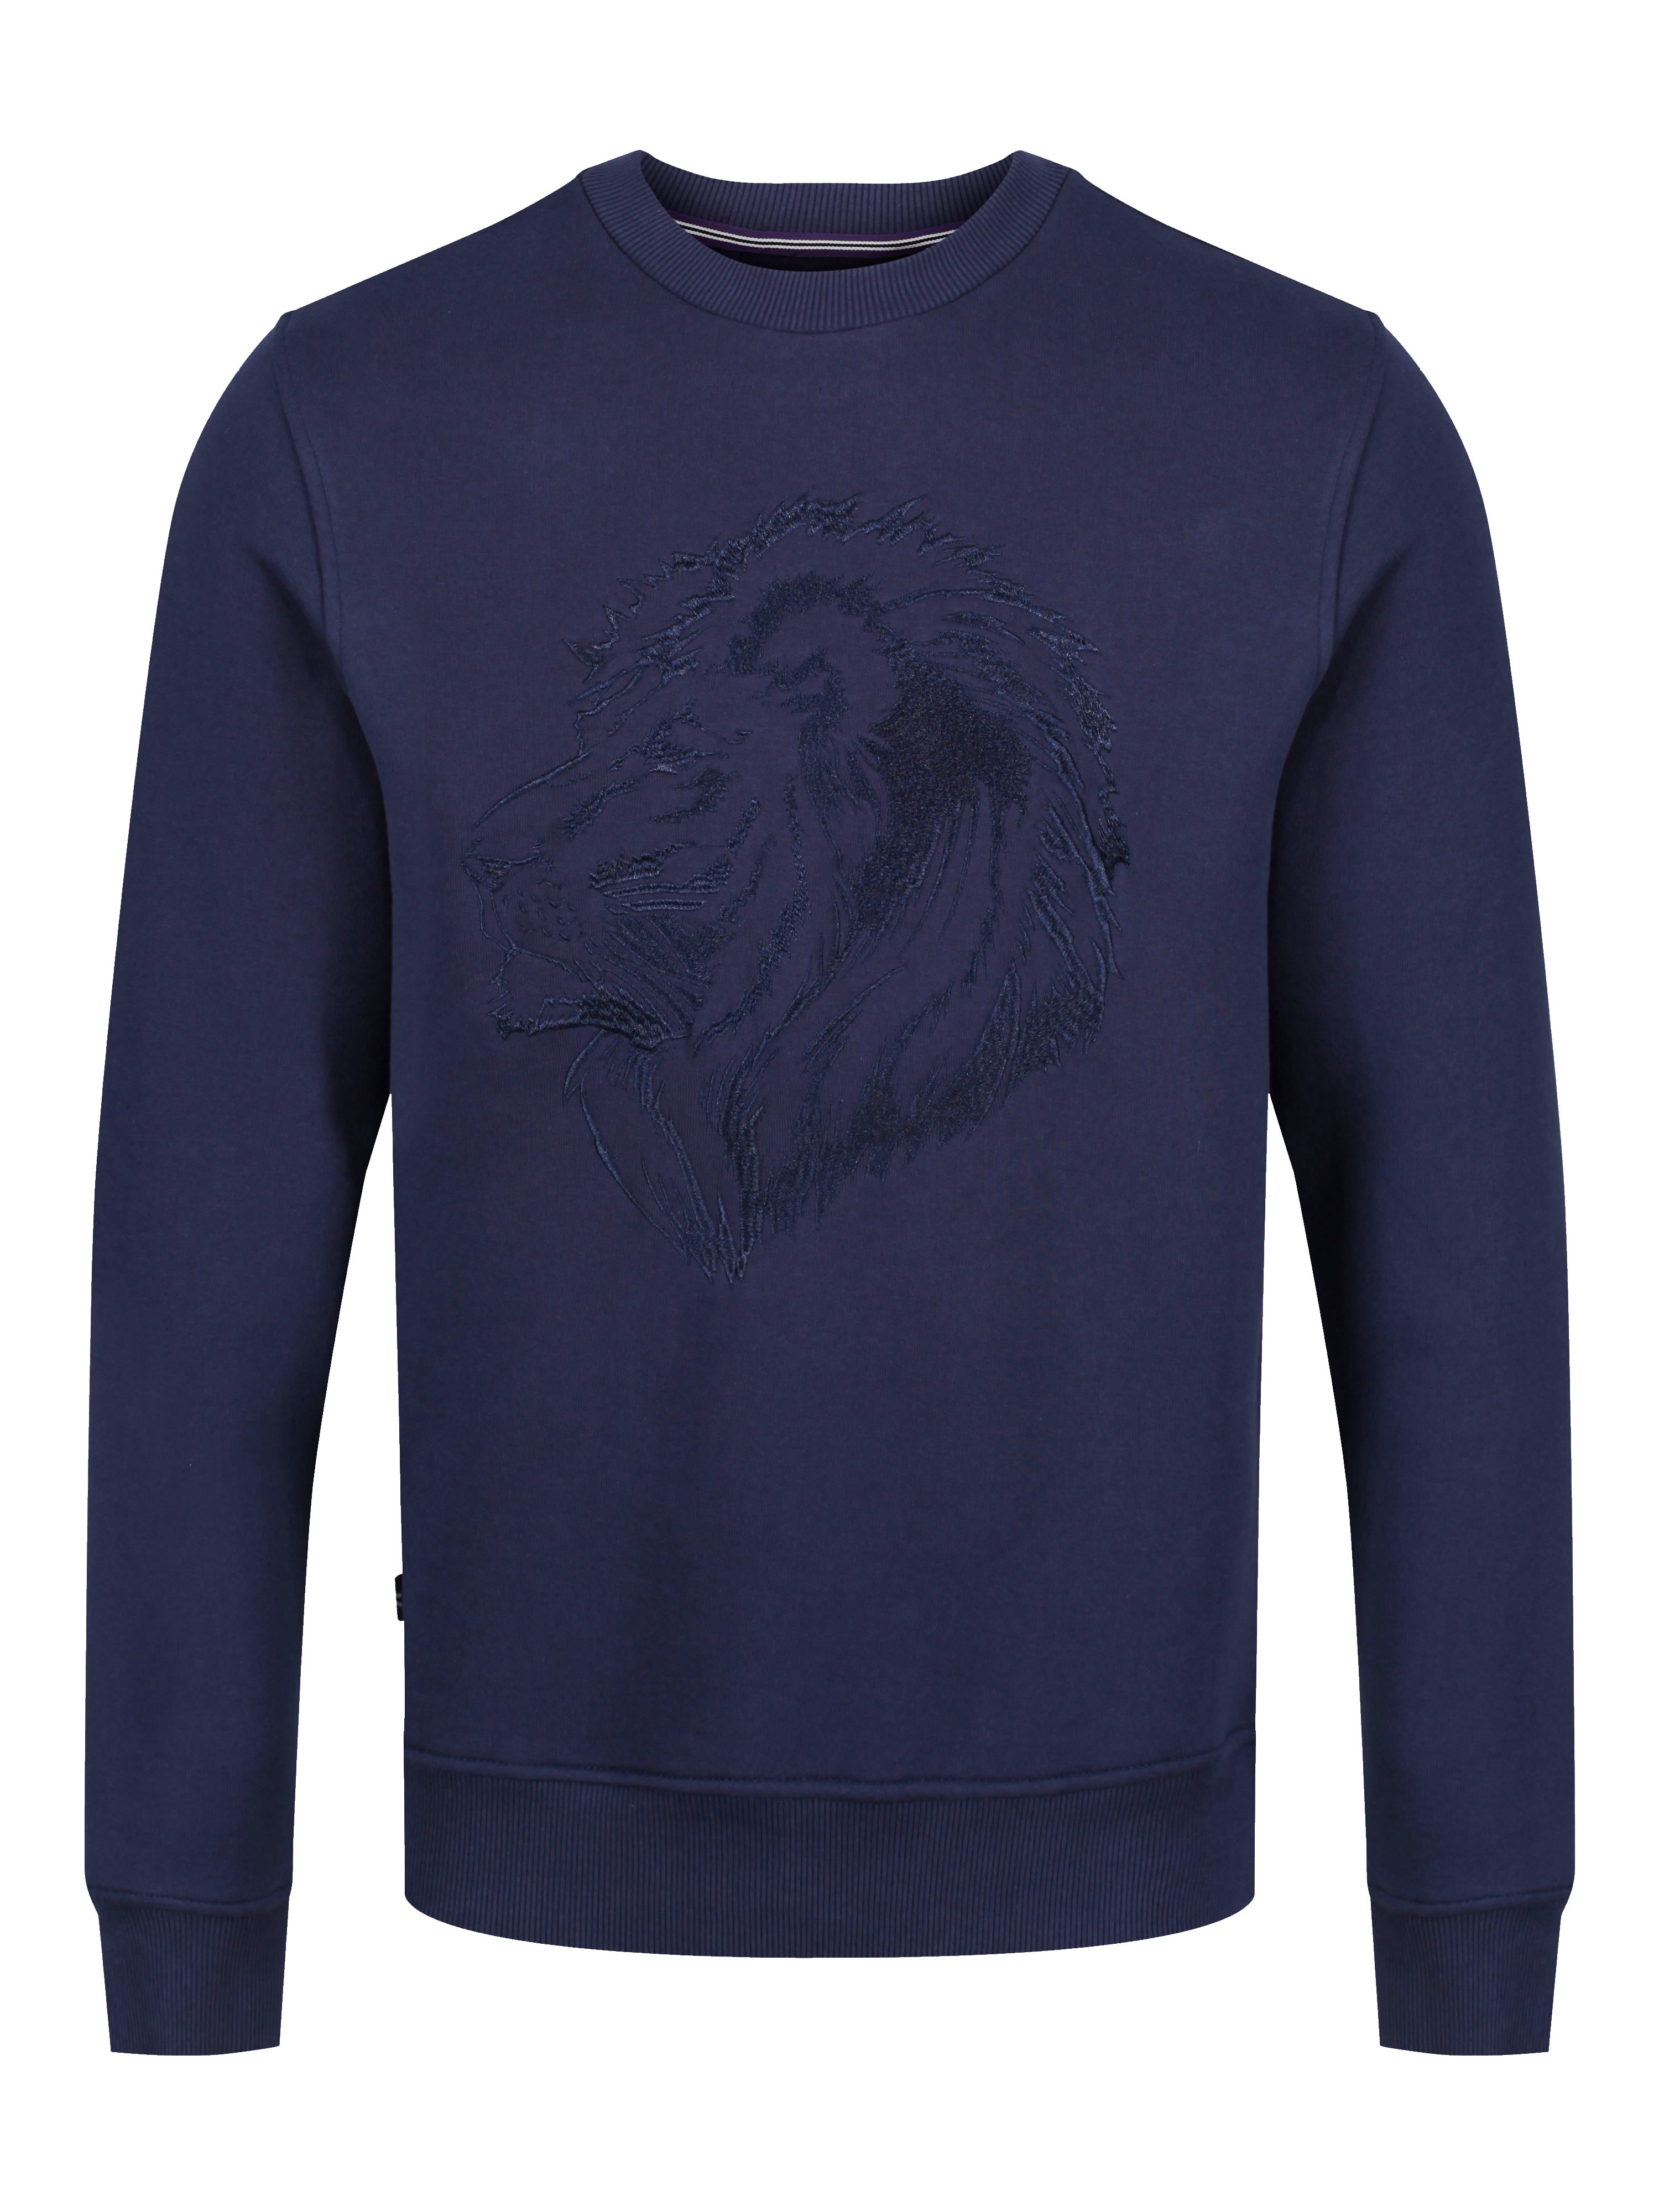 LUKE 1977 Bonds Embroidery Detailed Crew Neck Sweatshirt